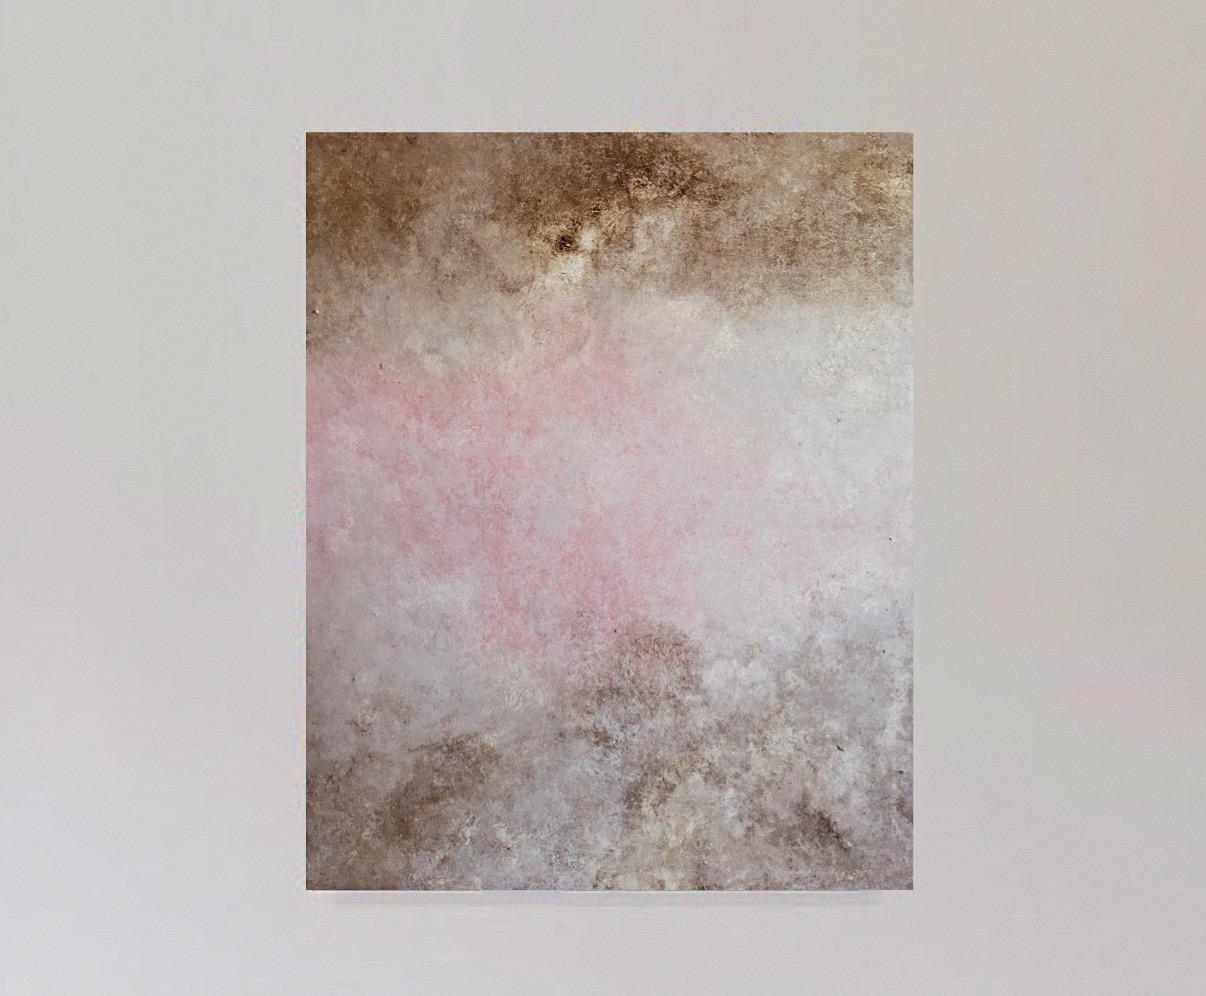 Marine Bonzom - Artiste Peintre Biarritz - Home - Rose